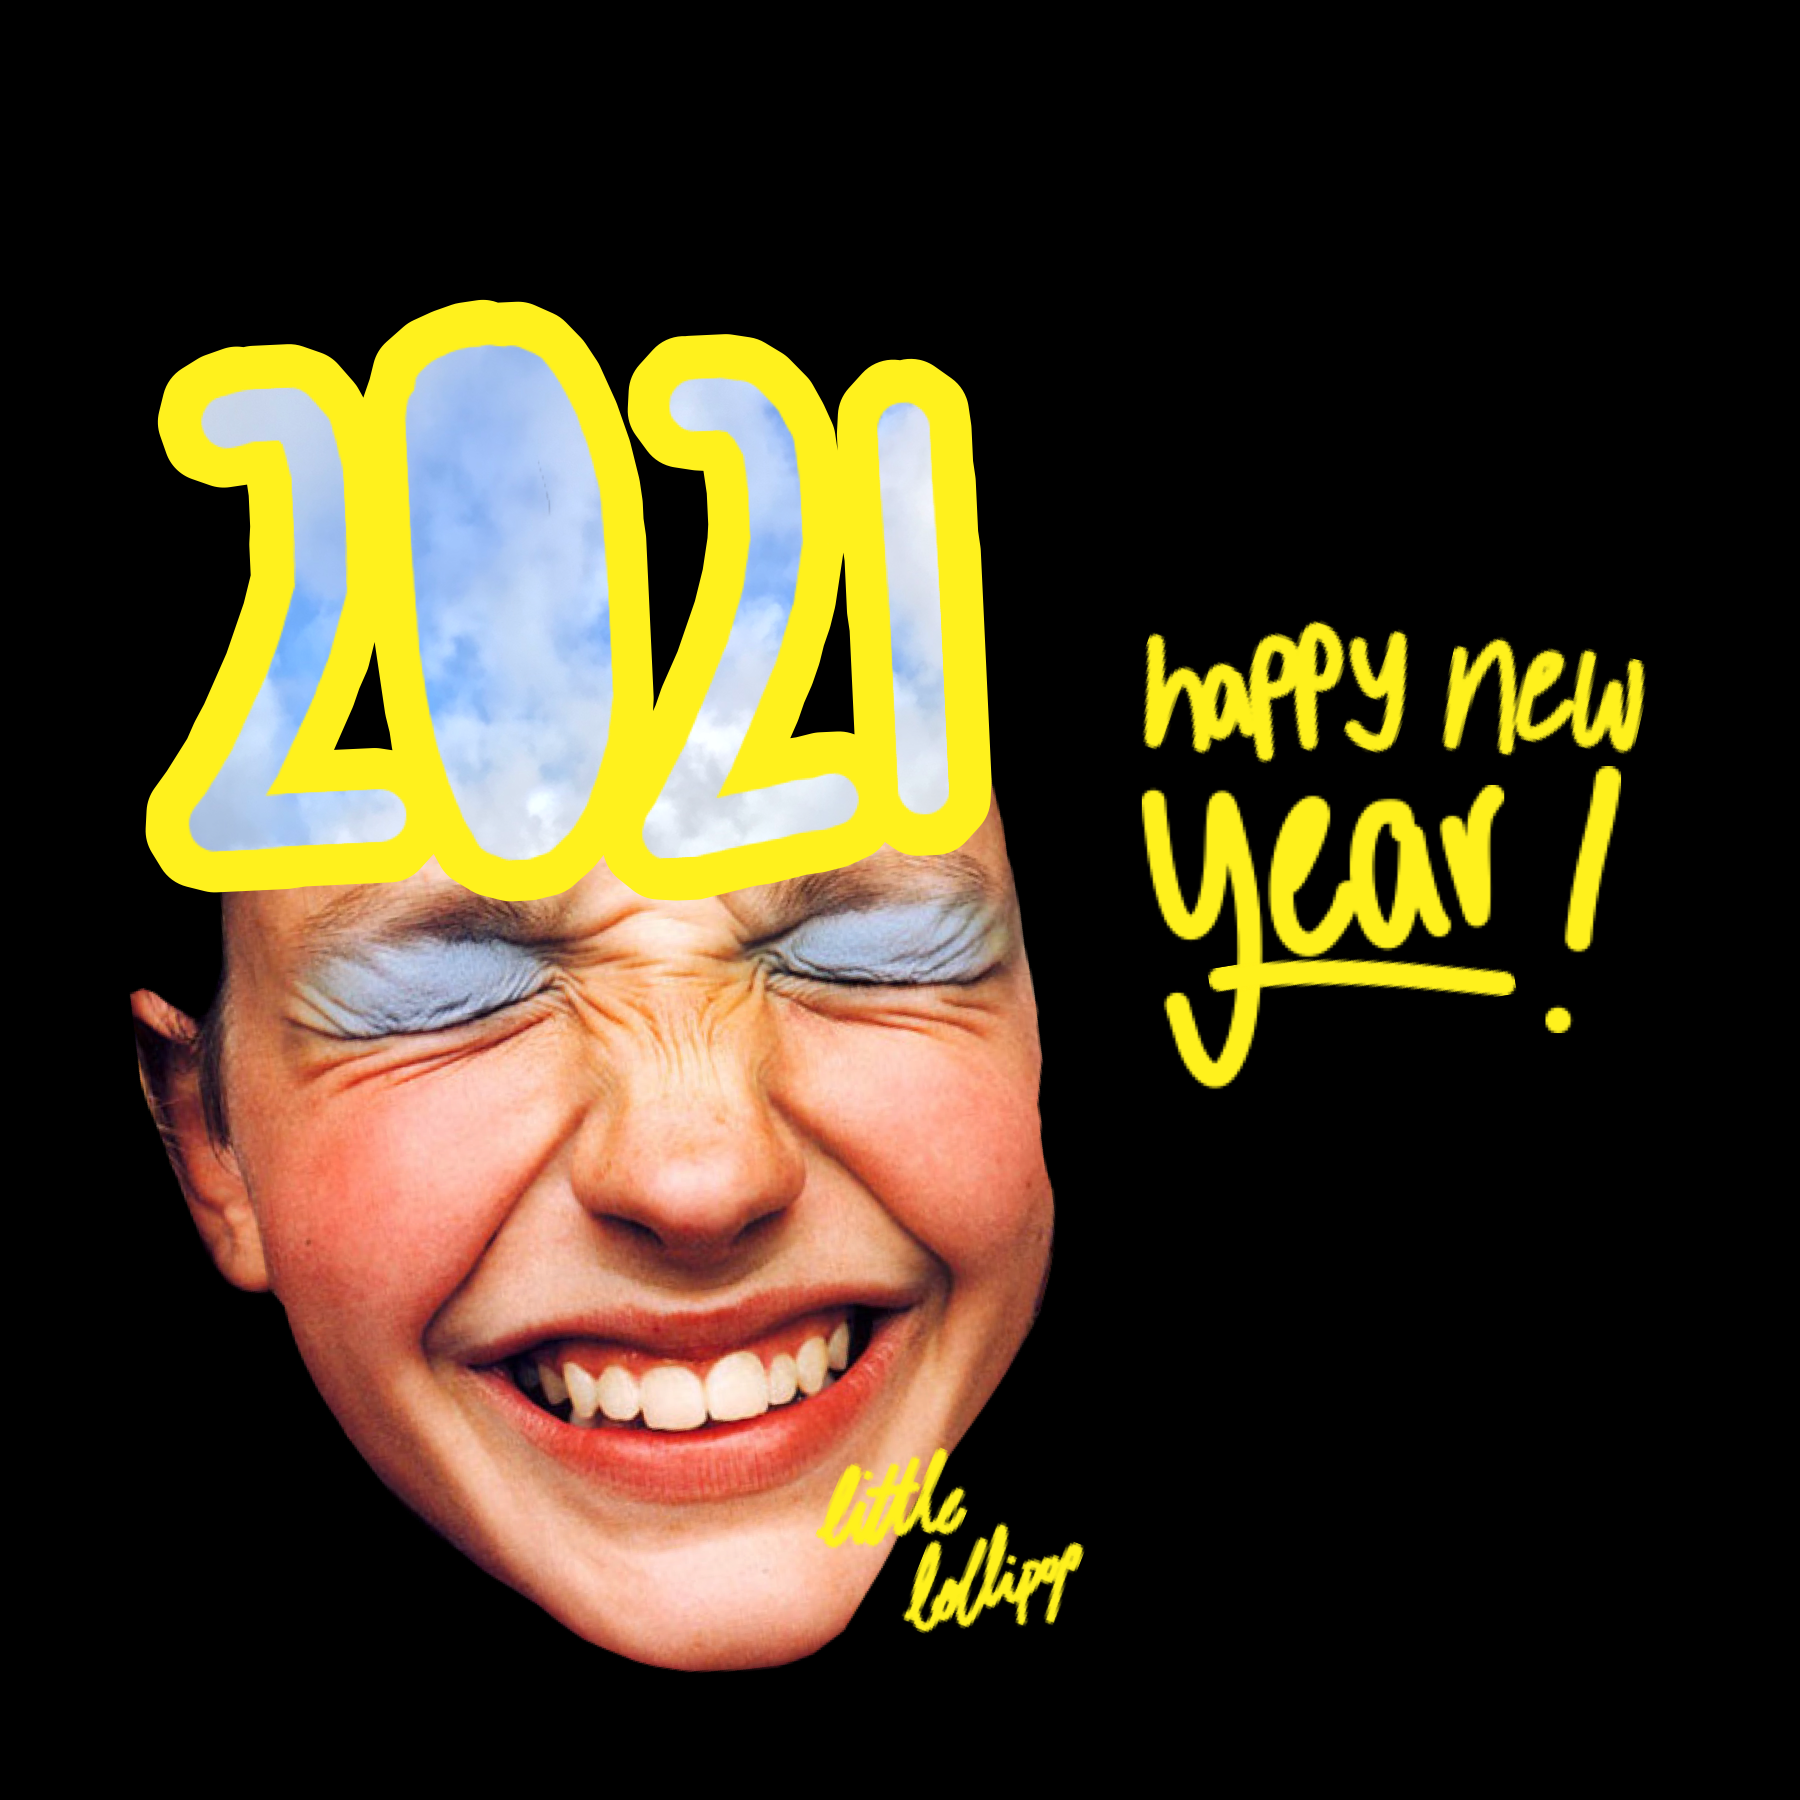 ✨✨✨✨ 2021! ✨✨✨✨